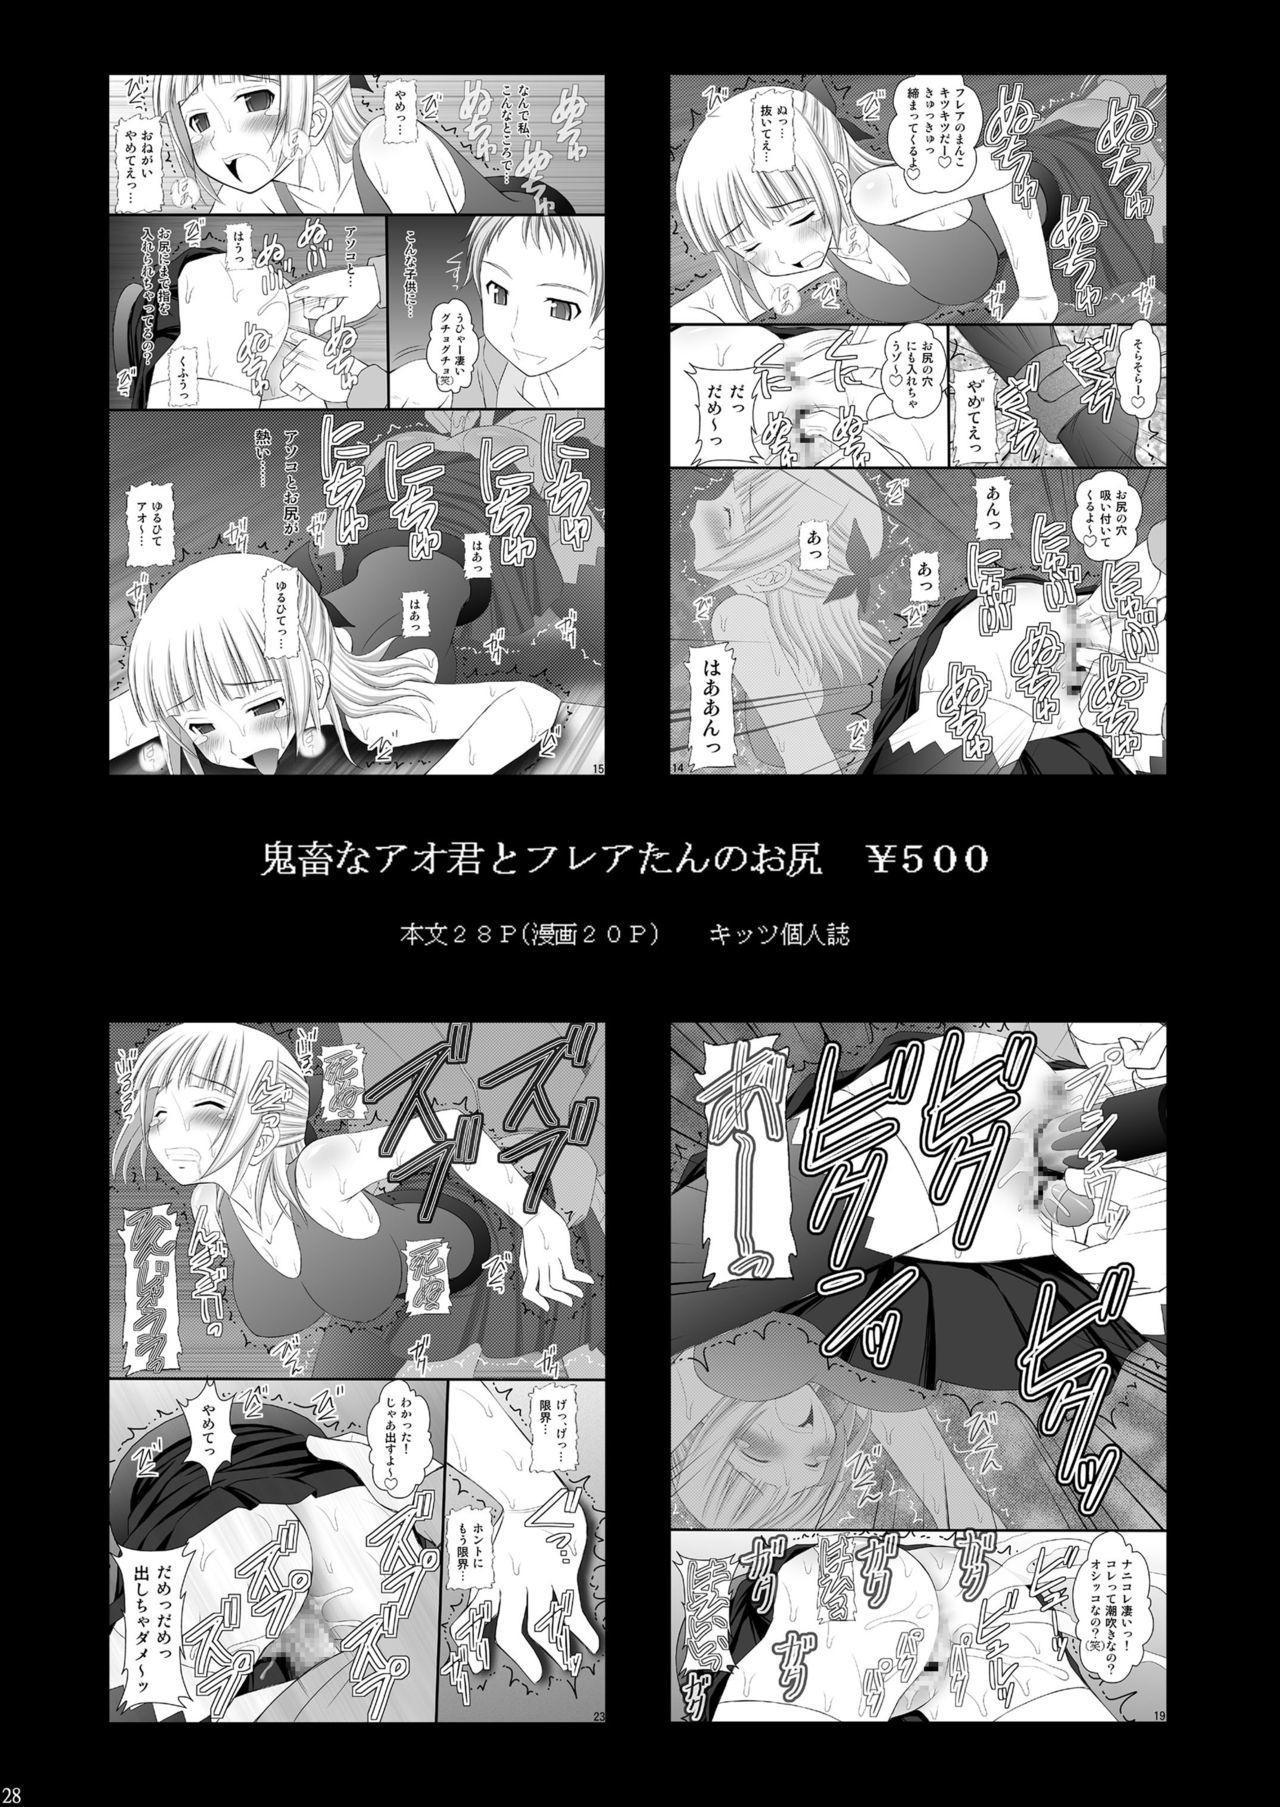 [Asanoya (Kittsu)] Toraware Hime III - Asuna Nakadashi 100-nin Dekiru ka na   Hostage Princess III (Sword Art Online) [English] [HypnoMangaEditor] [Digital] 26